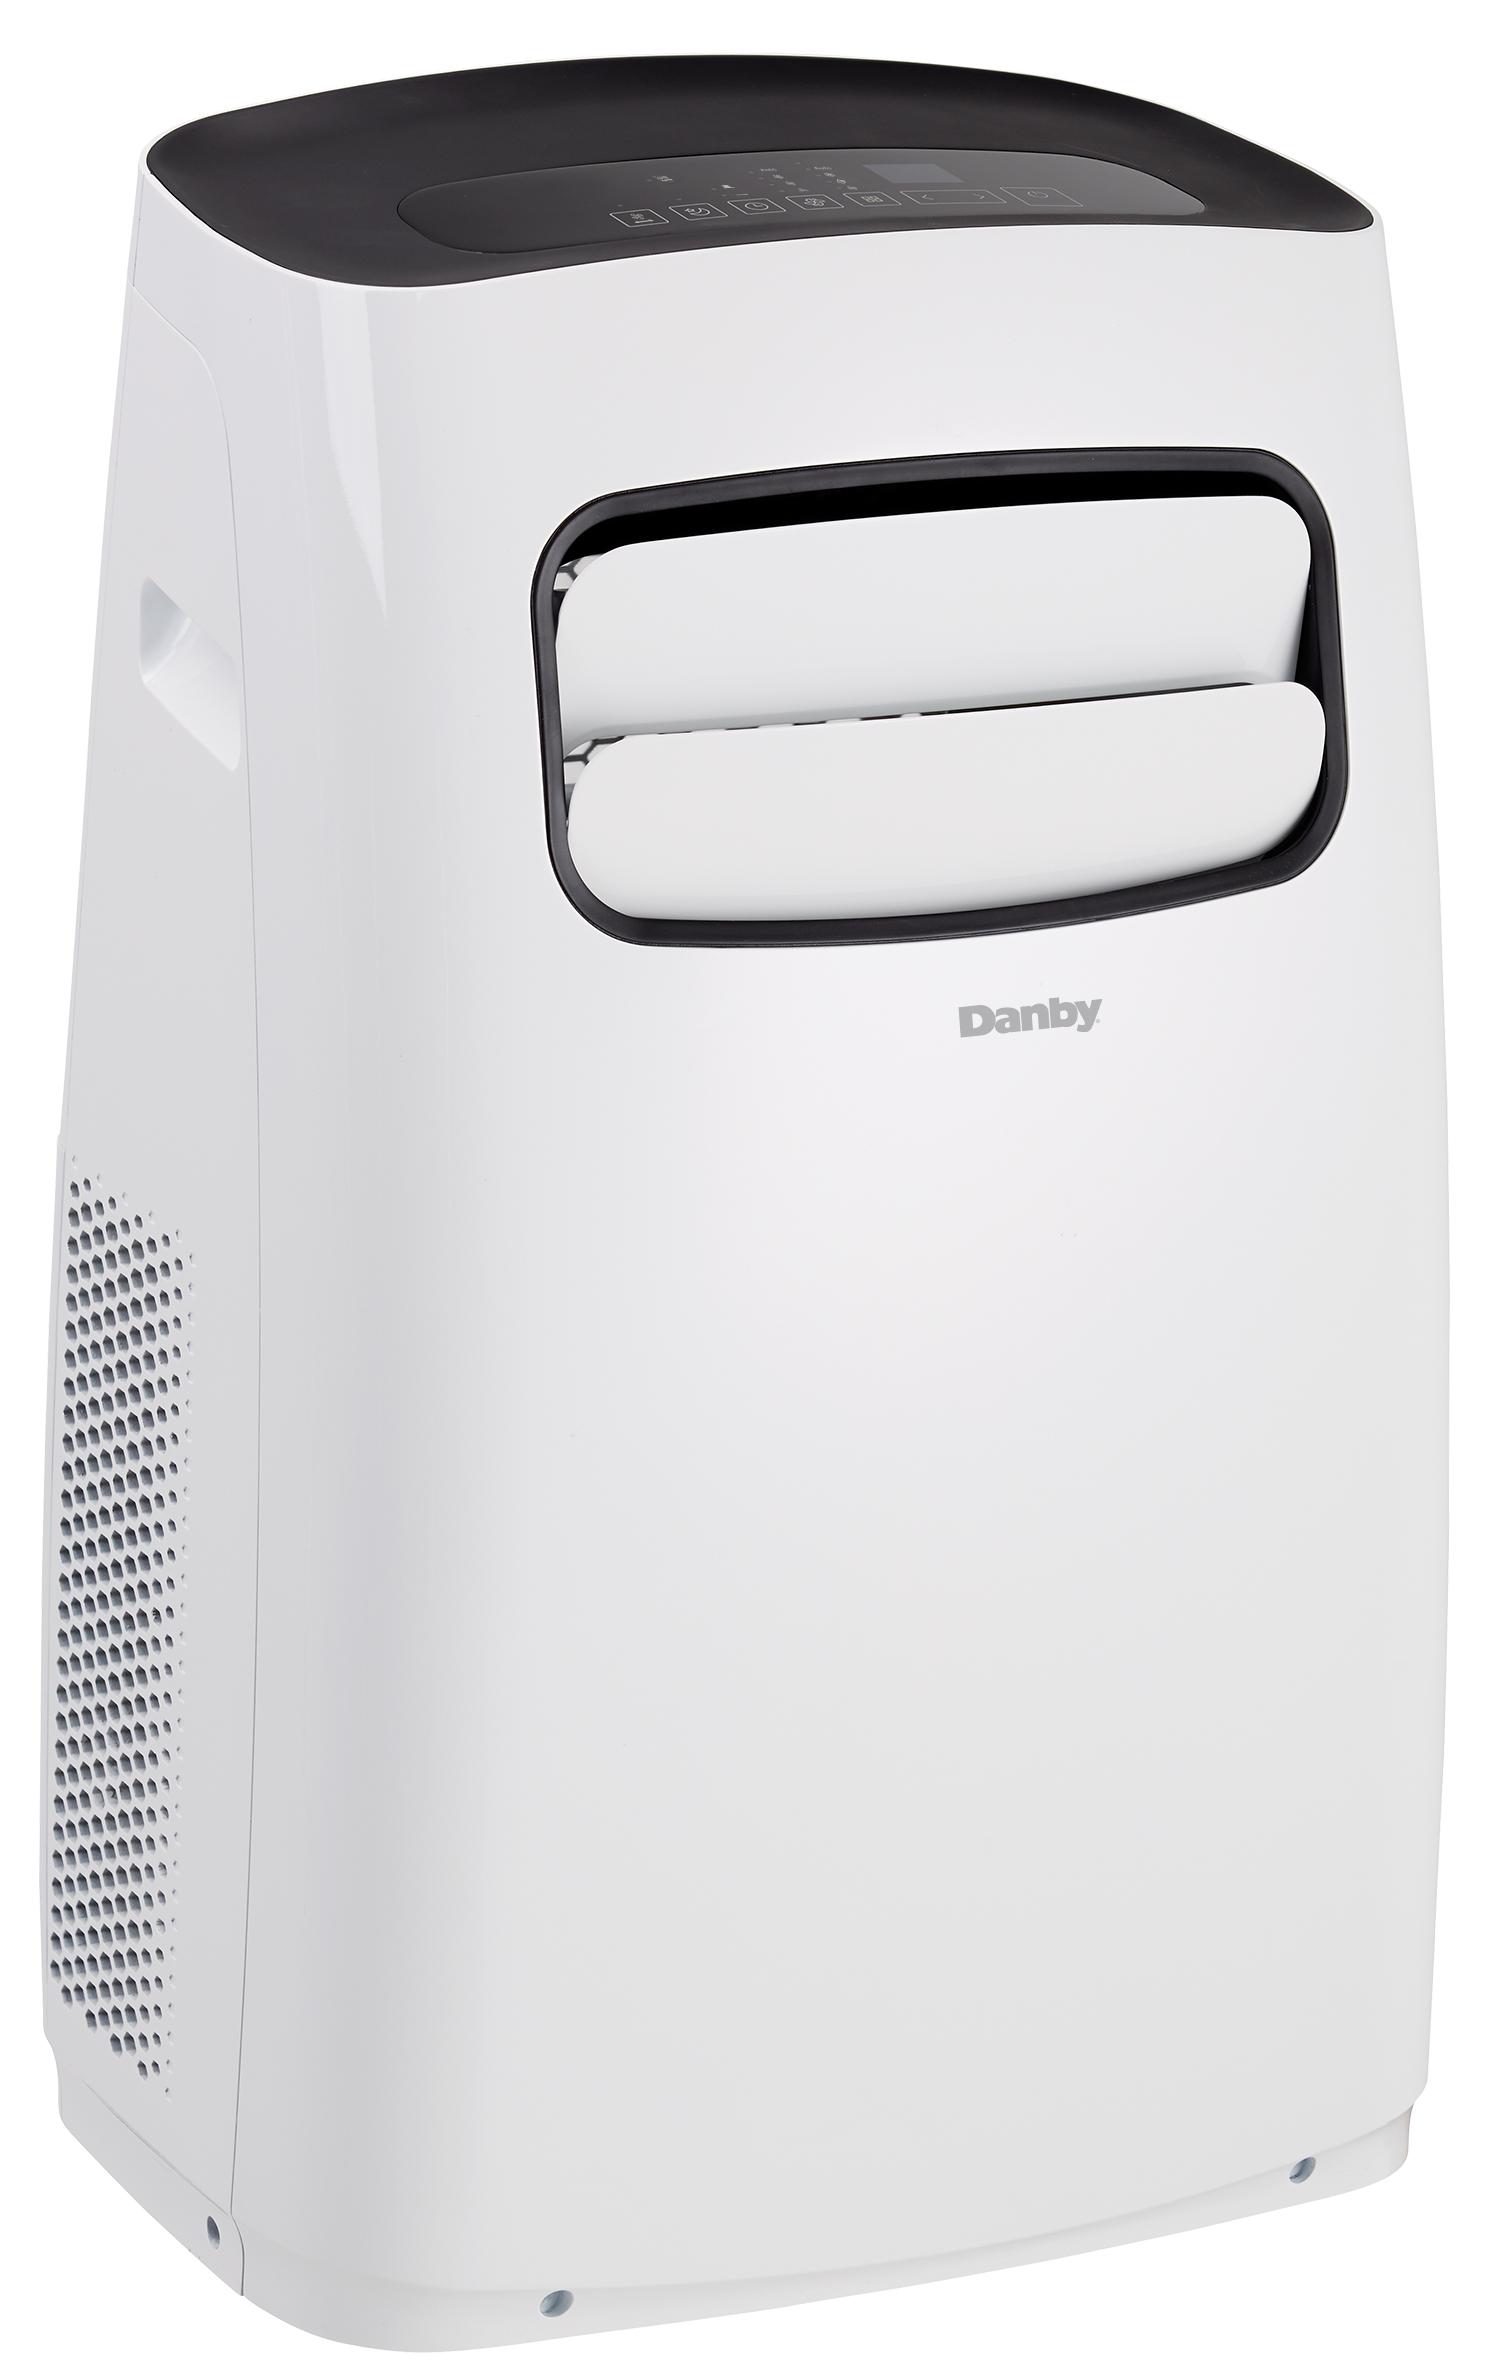 danby 8000 btu portable air conditioner manual